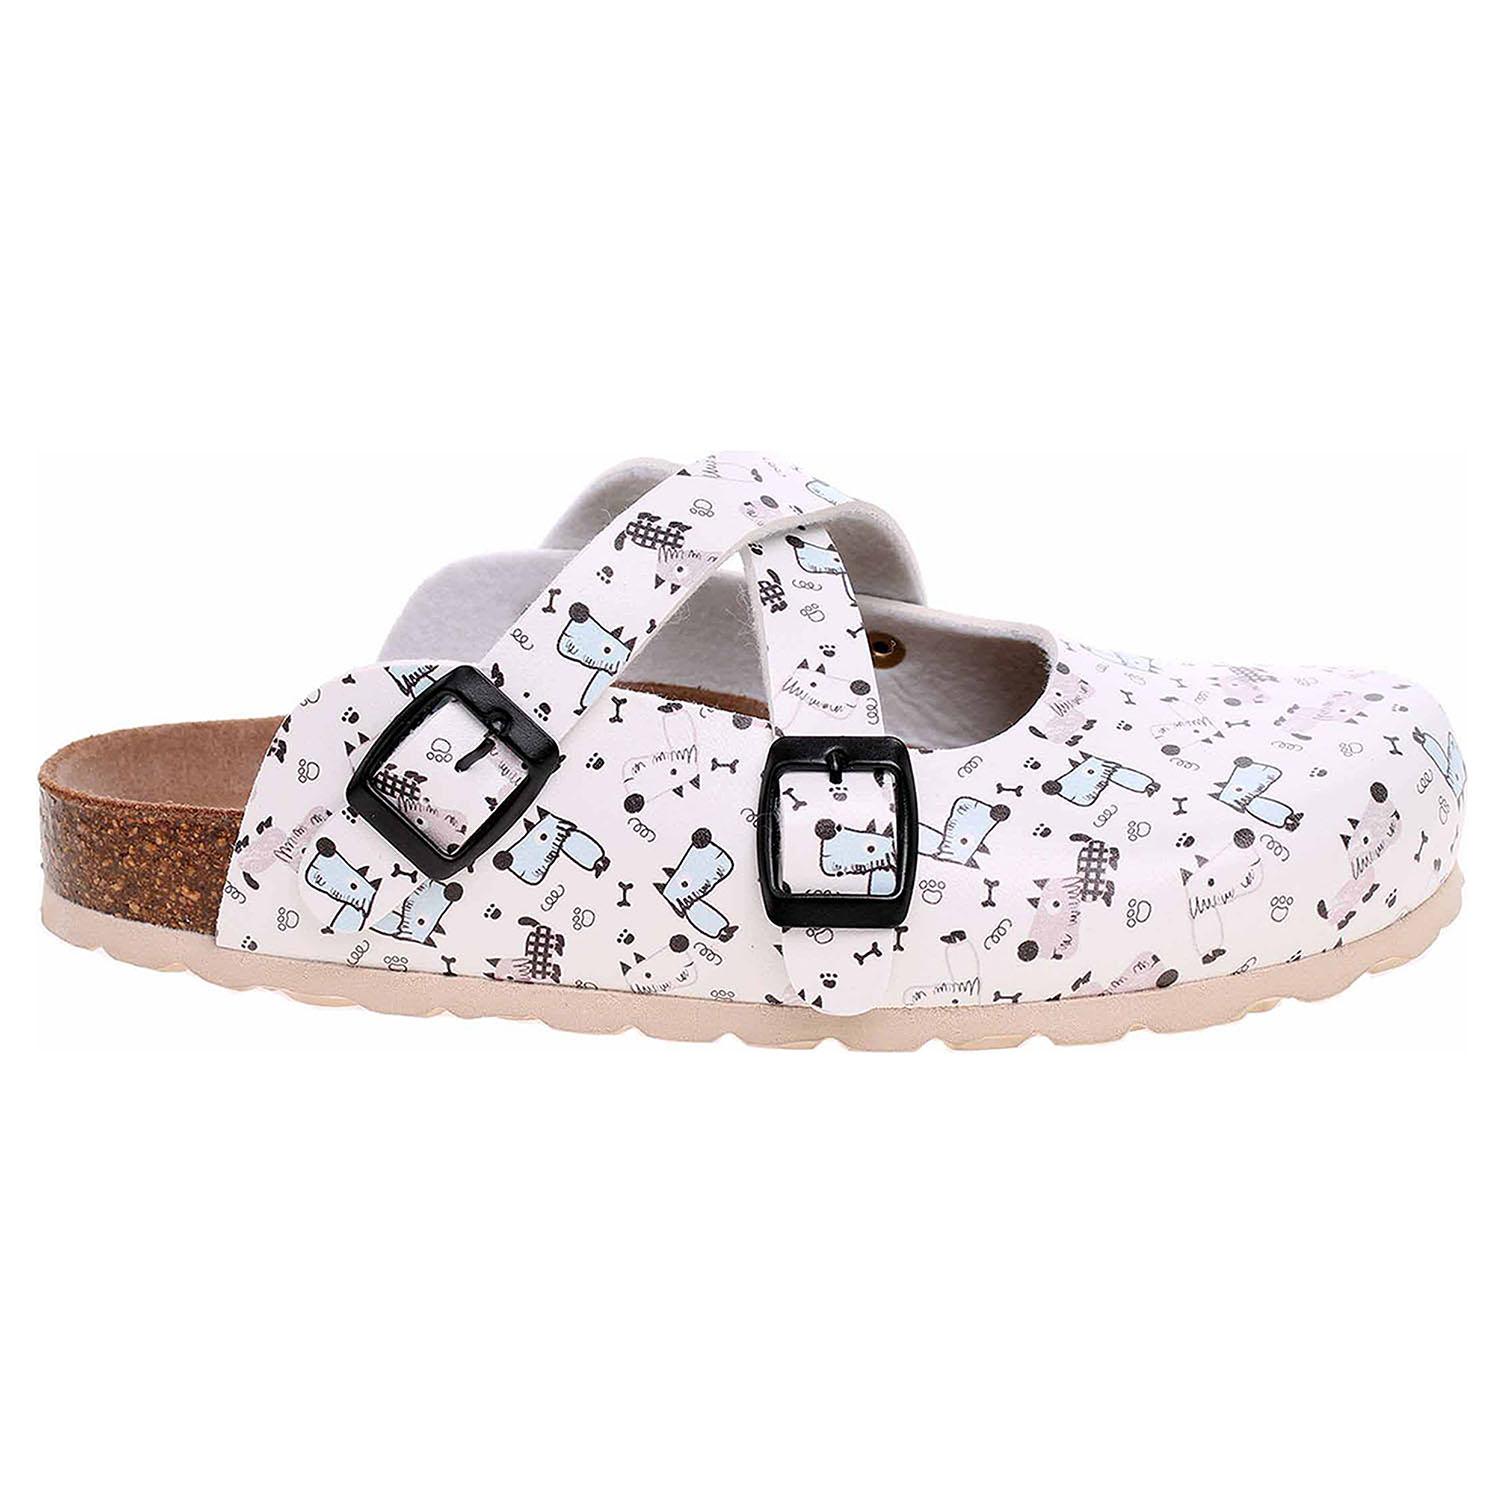 Dámské pantofle Forcare 101015 bílá-multi 101015 bílá/multi 39